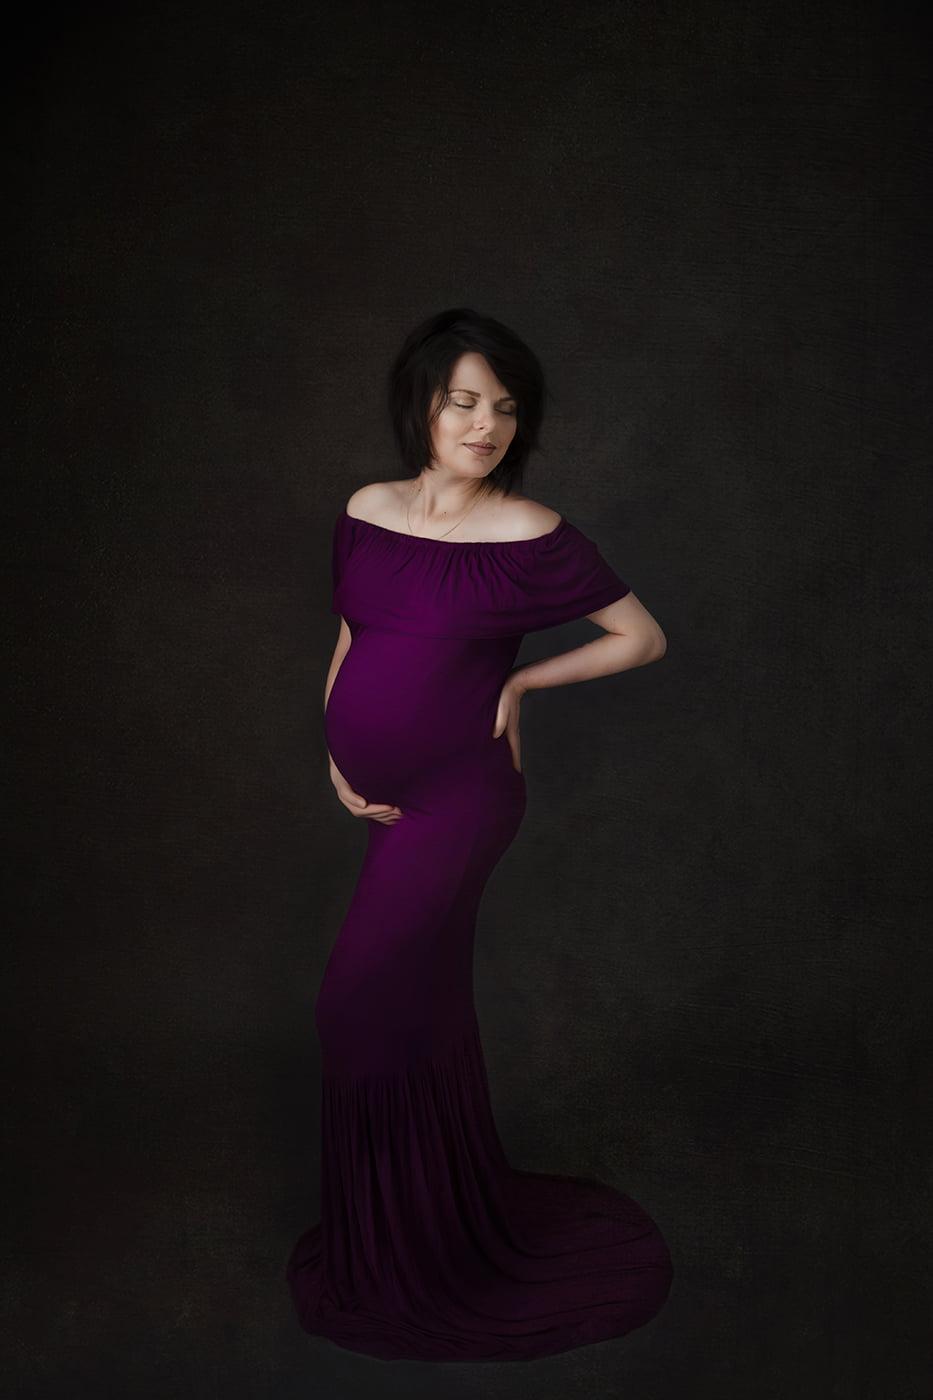 sedinta-foto-gravida-bucuresti-studio-maternitate-recuzita-pret-sarcina